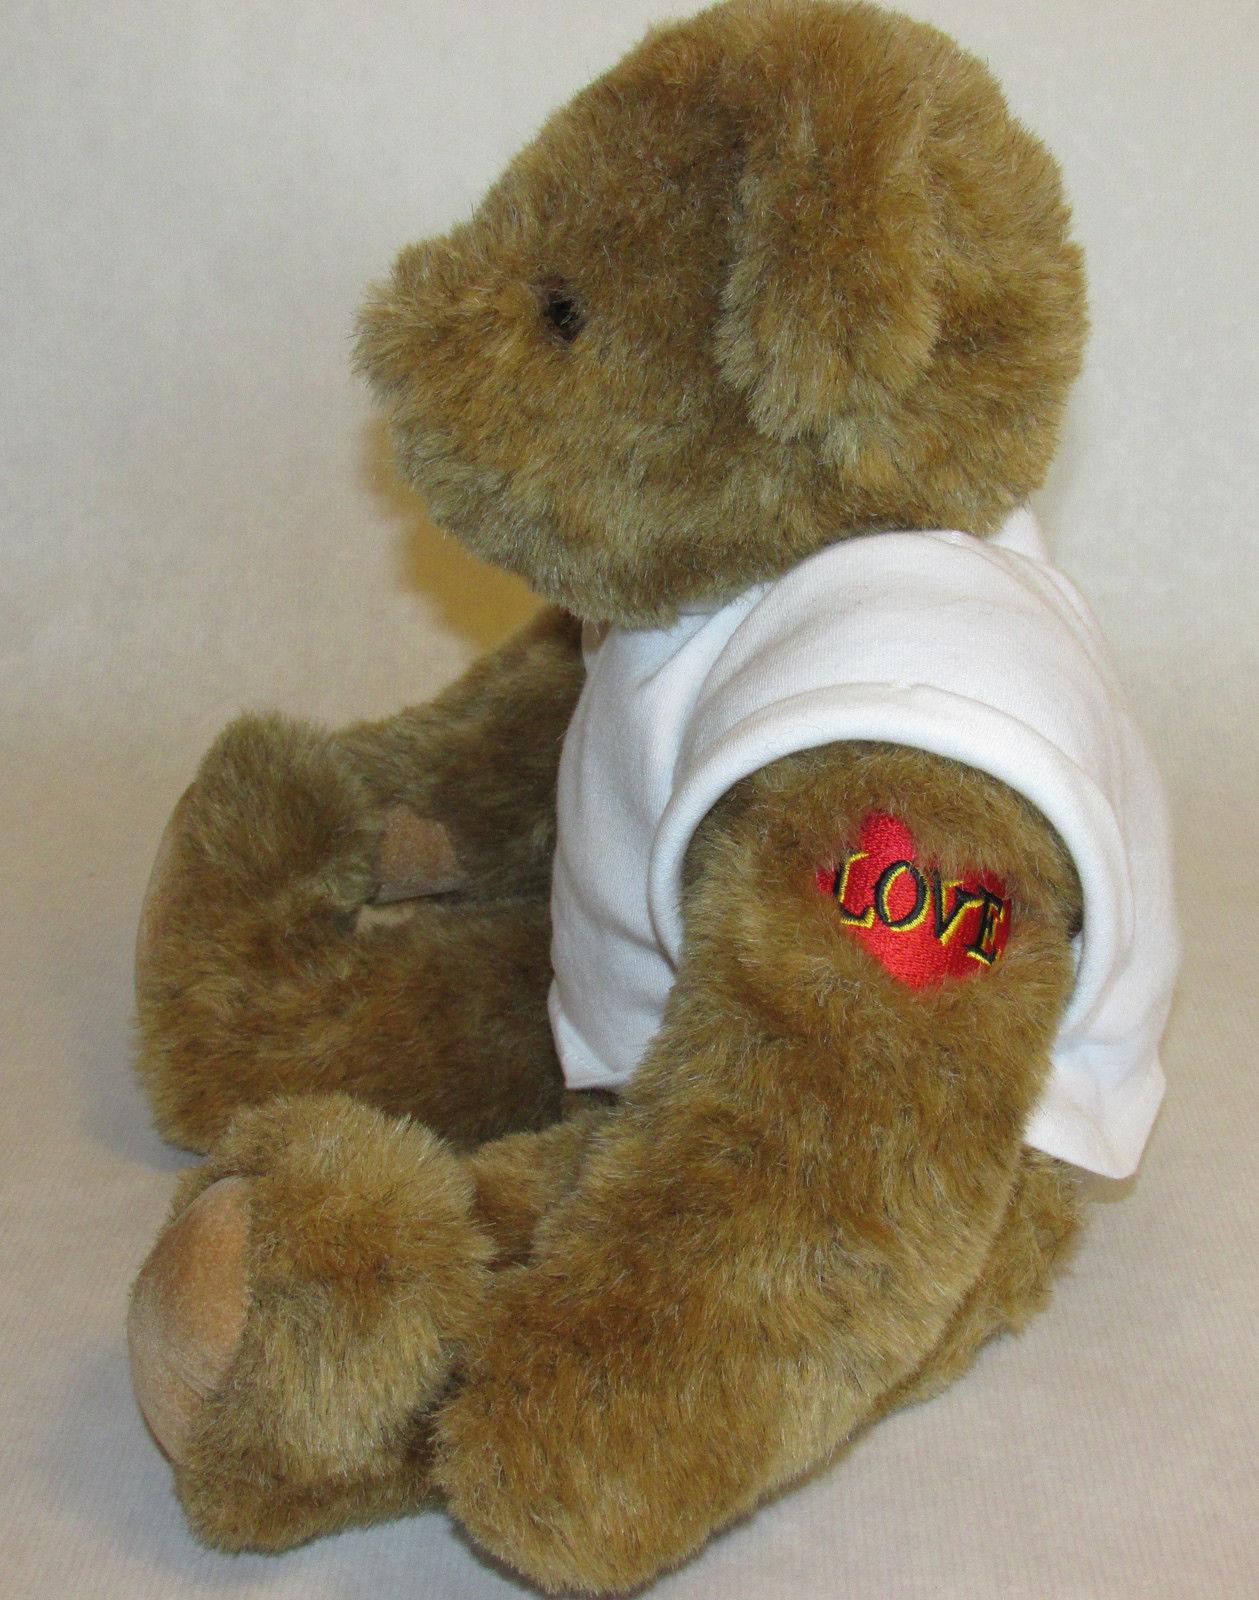 vermont teddy bear co Vermont bear found in: 15 born in vermont sweater bear, 15 logo t-shirt bear, 15 holstein bear, 15 classic bow tie bear, giant.